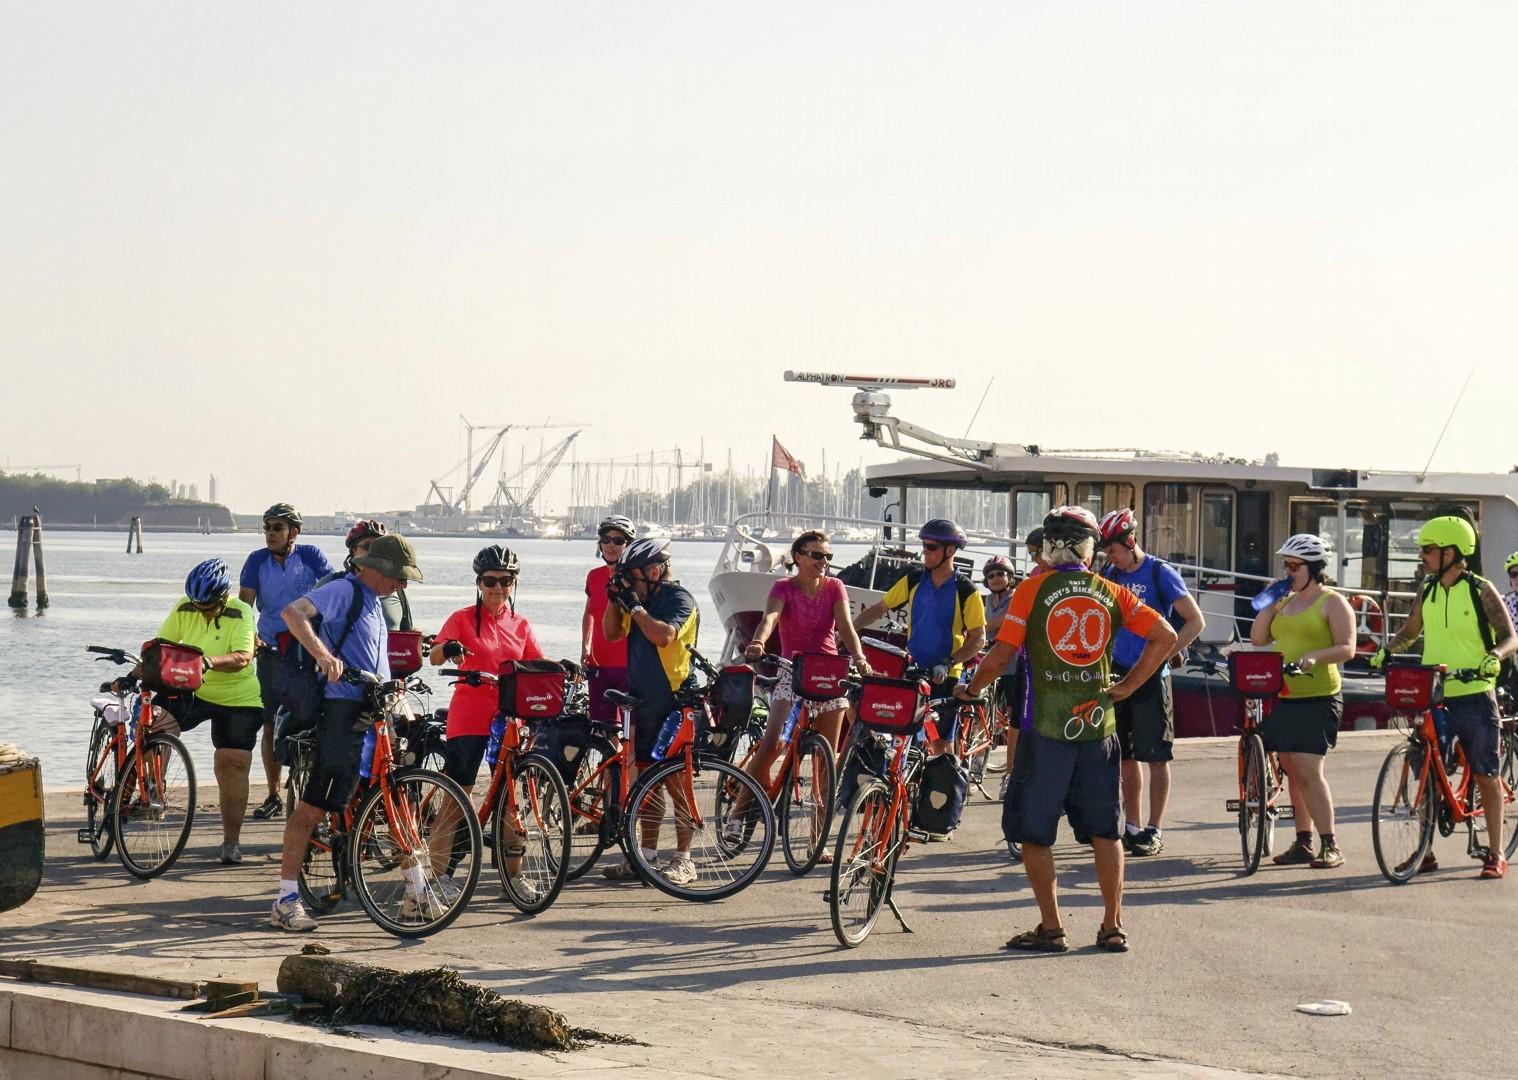 waterwaysofvenice14.jpg - Italy - Venetian Waterways (Mantova to Venice) - Bike and Barge Holiday - Leisure Cycling